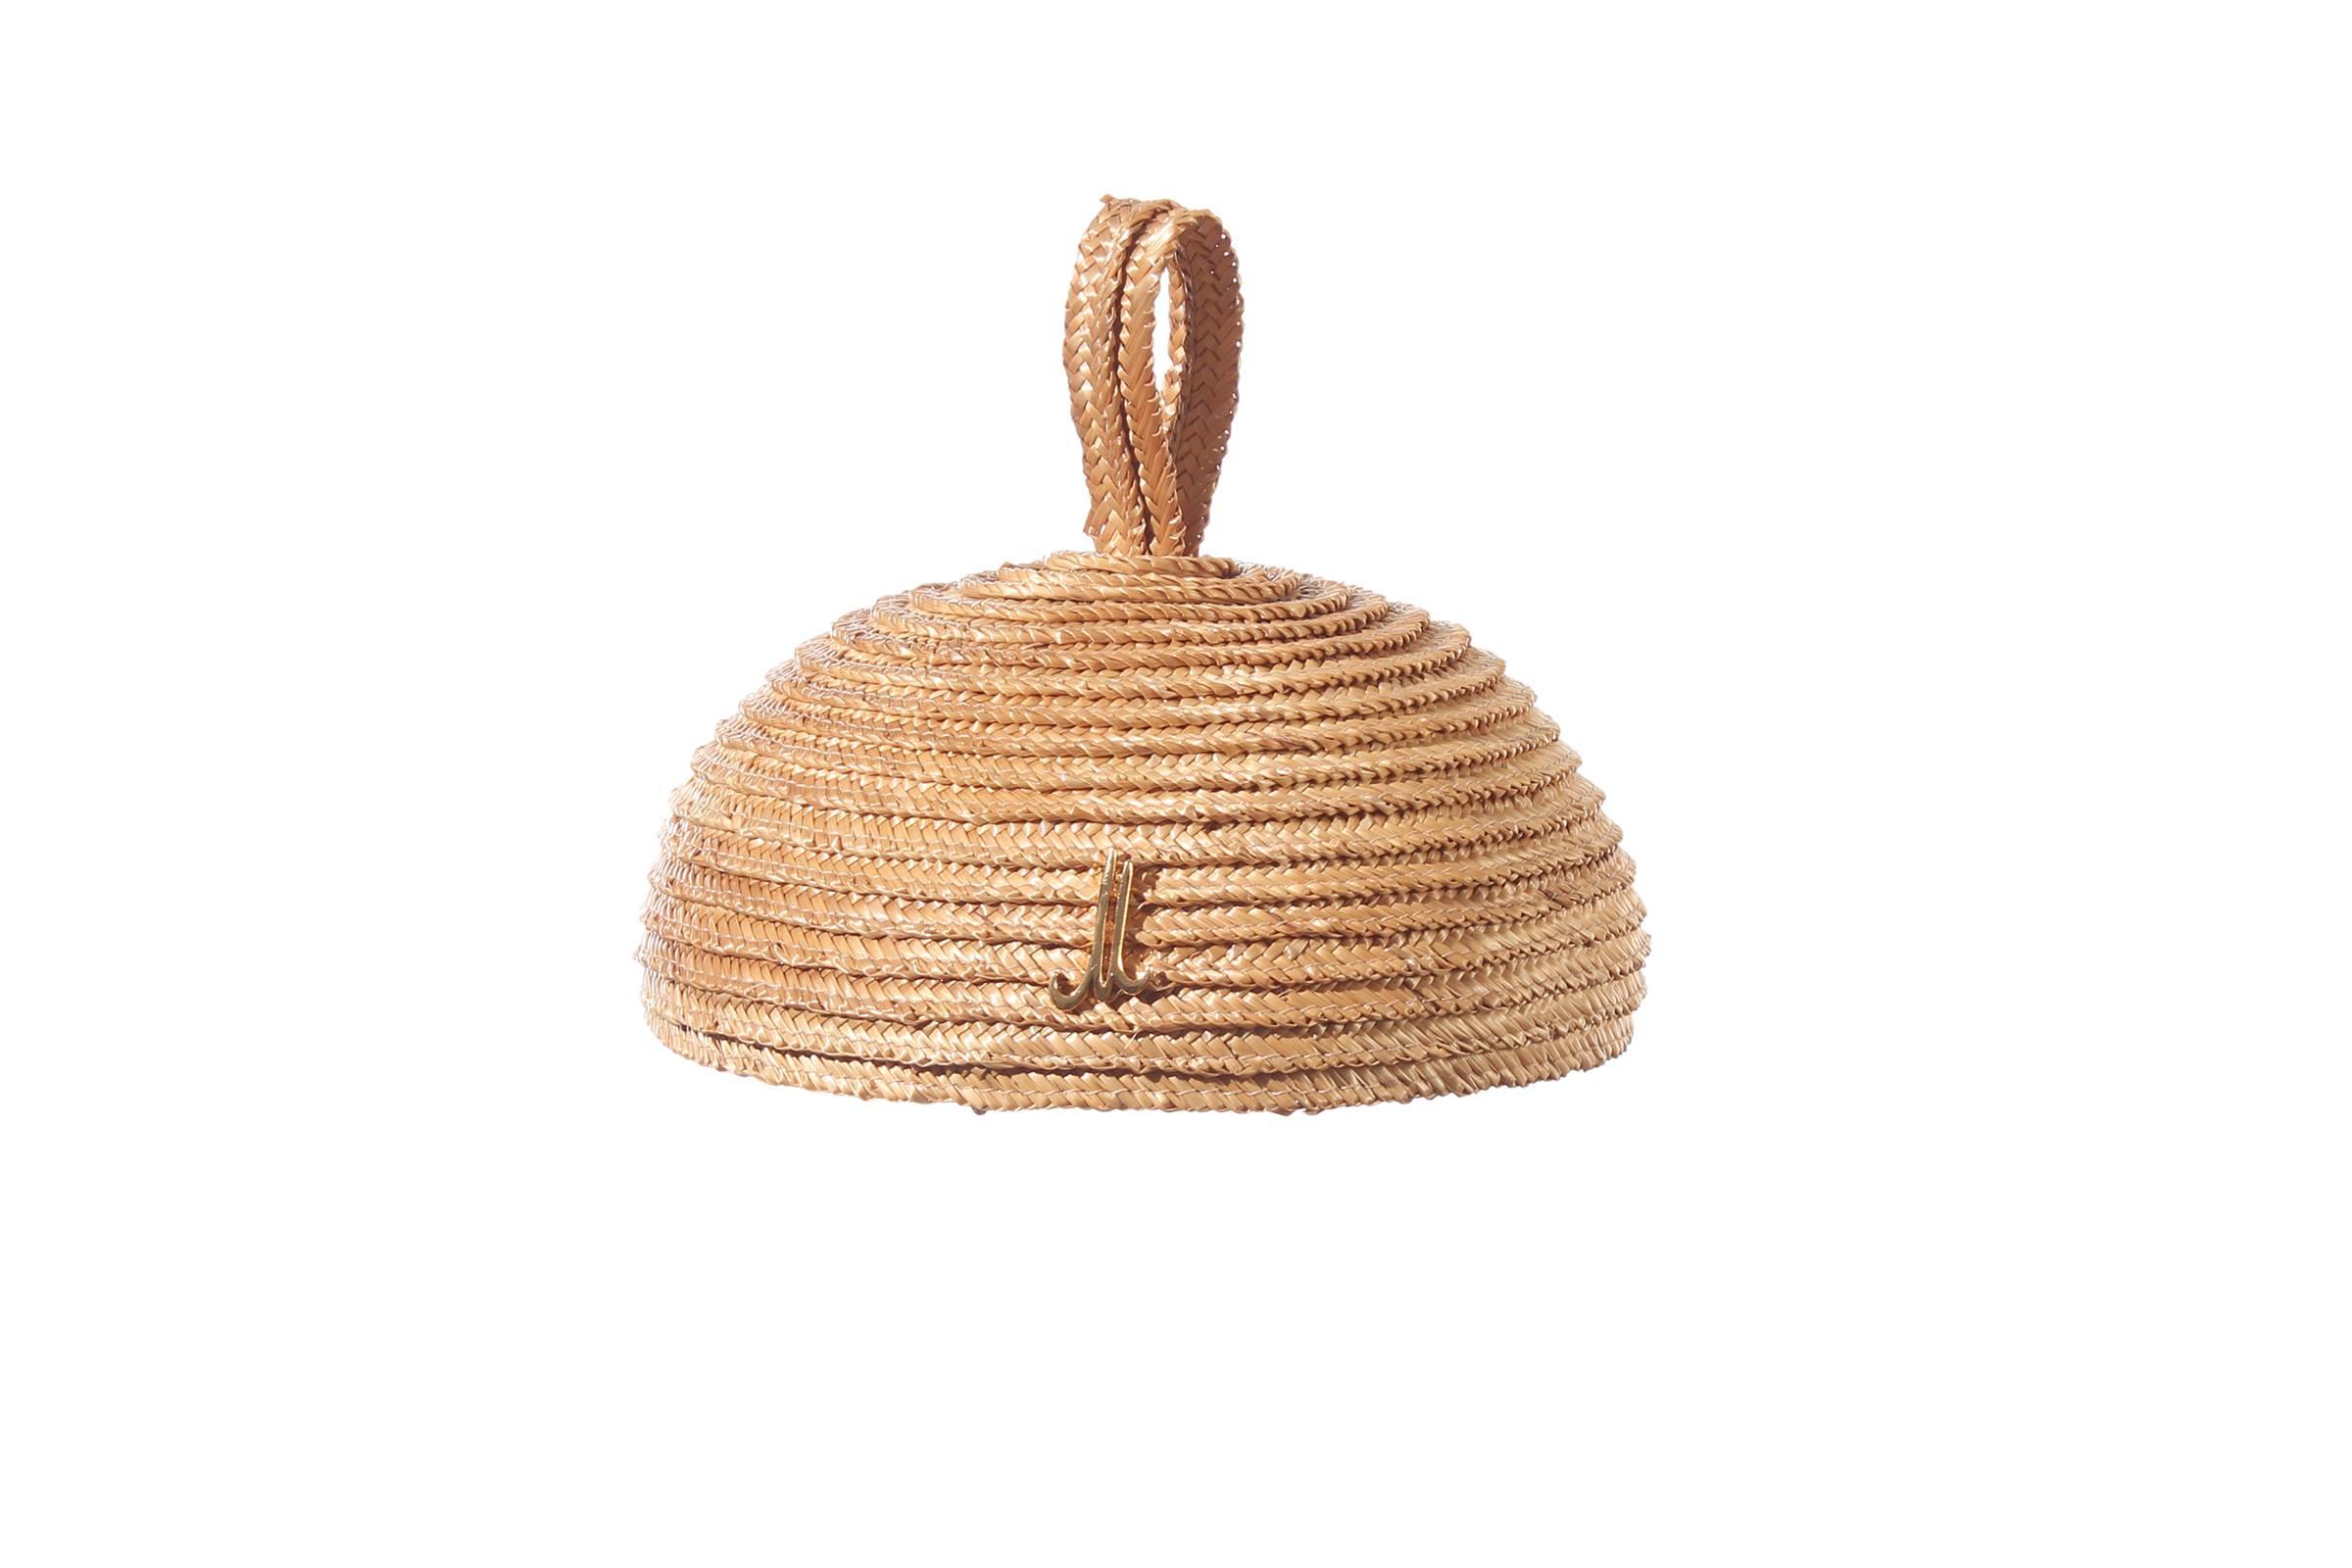 pillbox ADELE rice straw braid